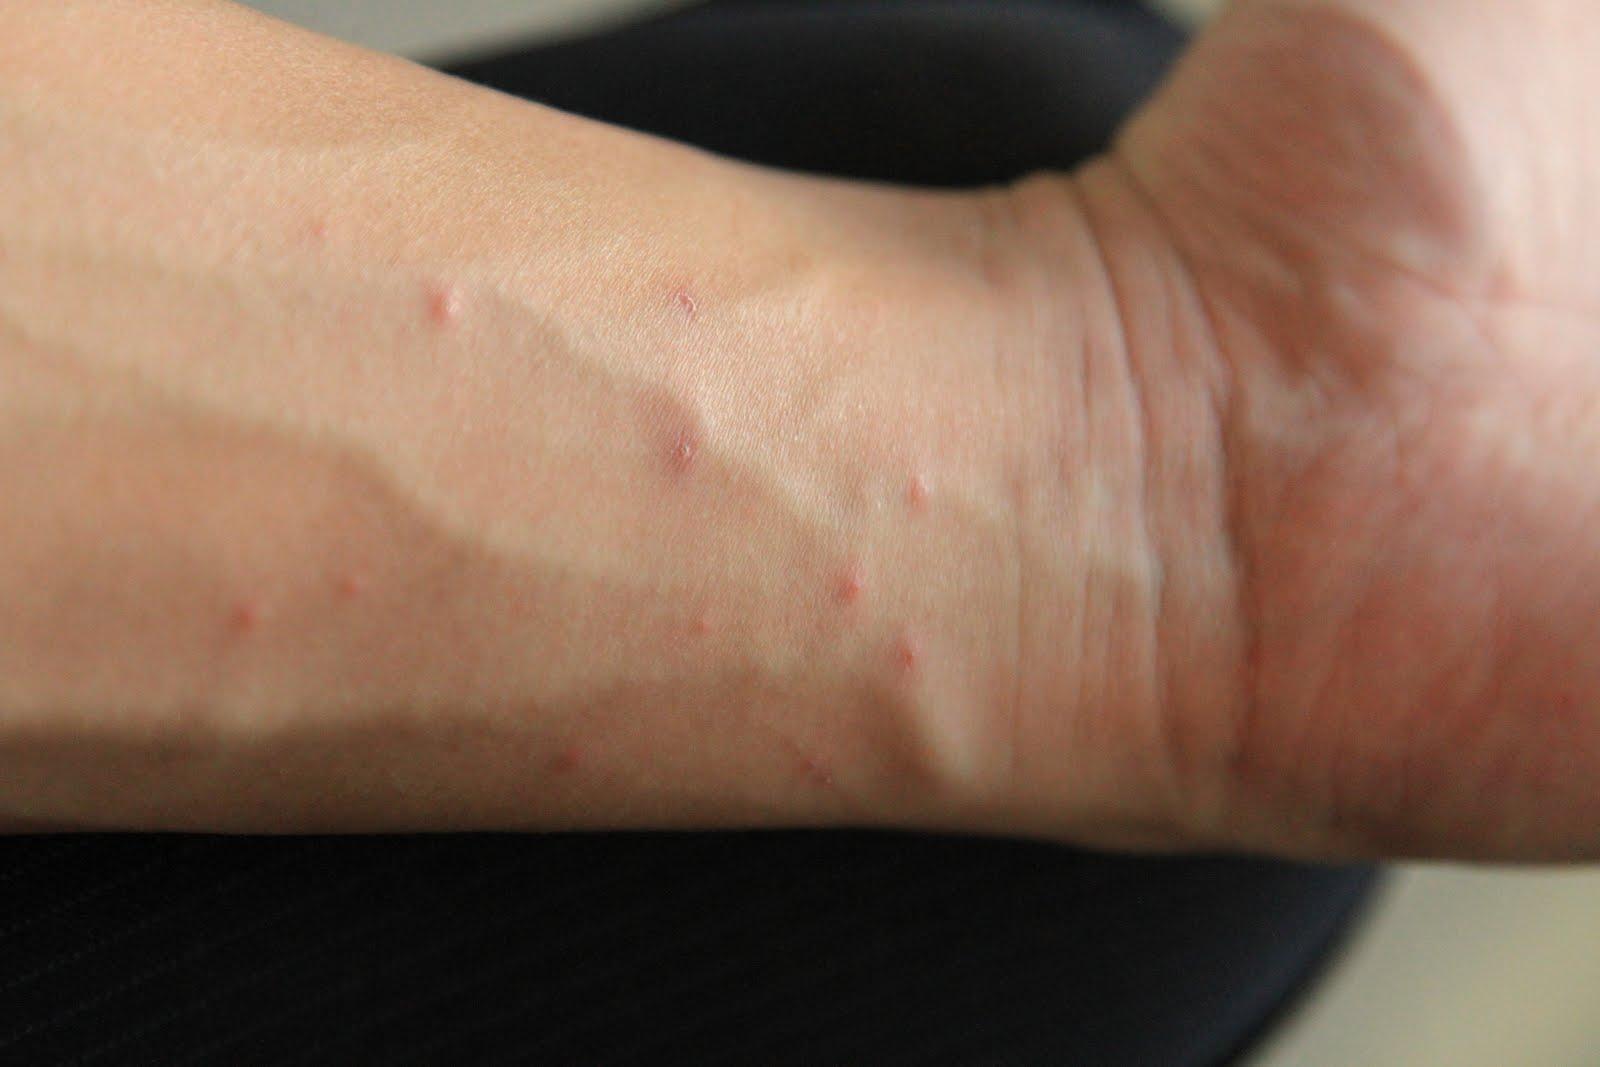 scabies on hands | Best Scabies Treatment: Dr. Scabies ...